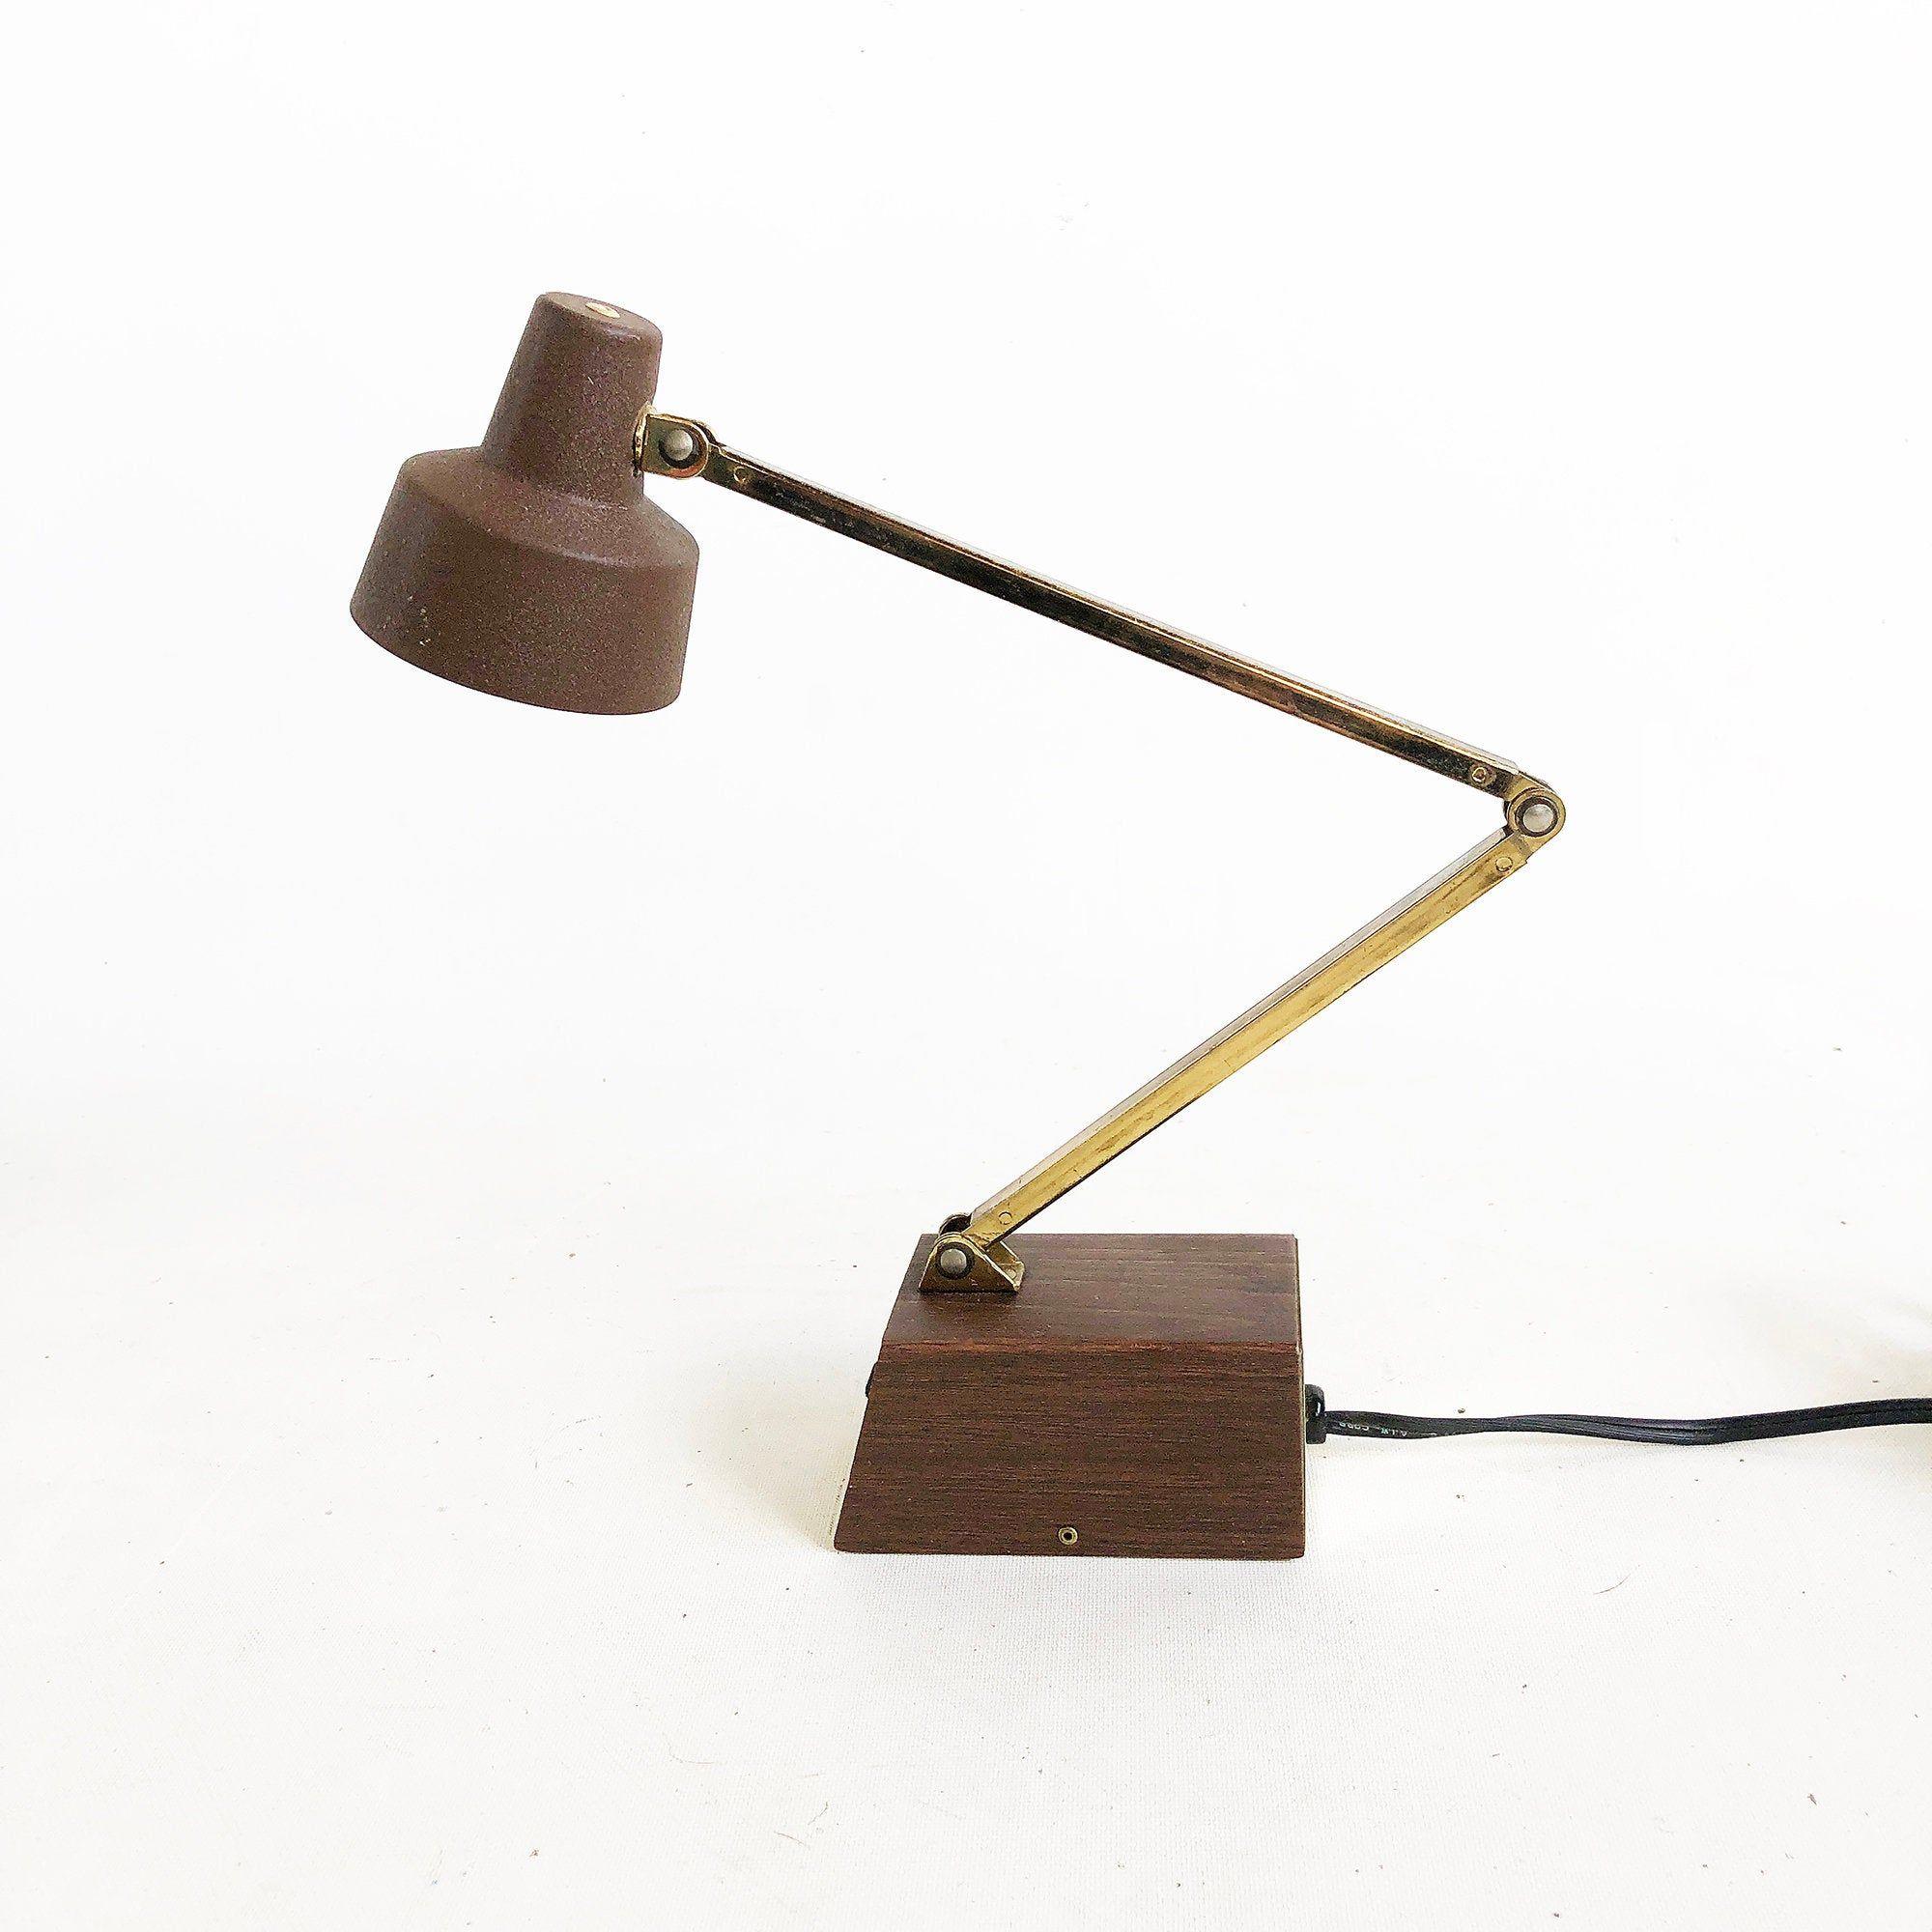 1970/'s Task Lamp in Tensor Style by Electrix Vintage Lighting.